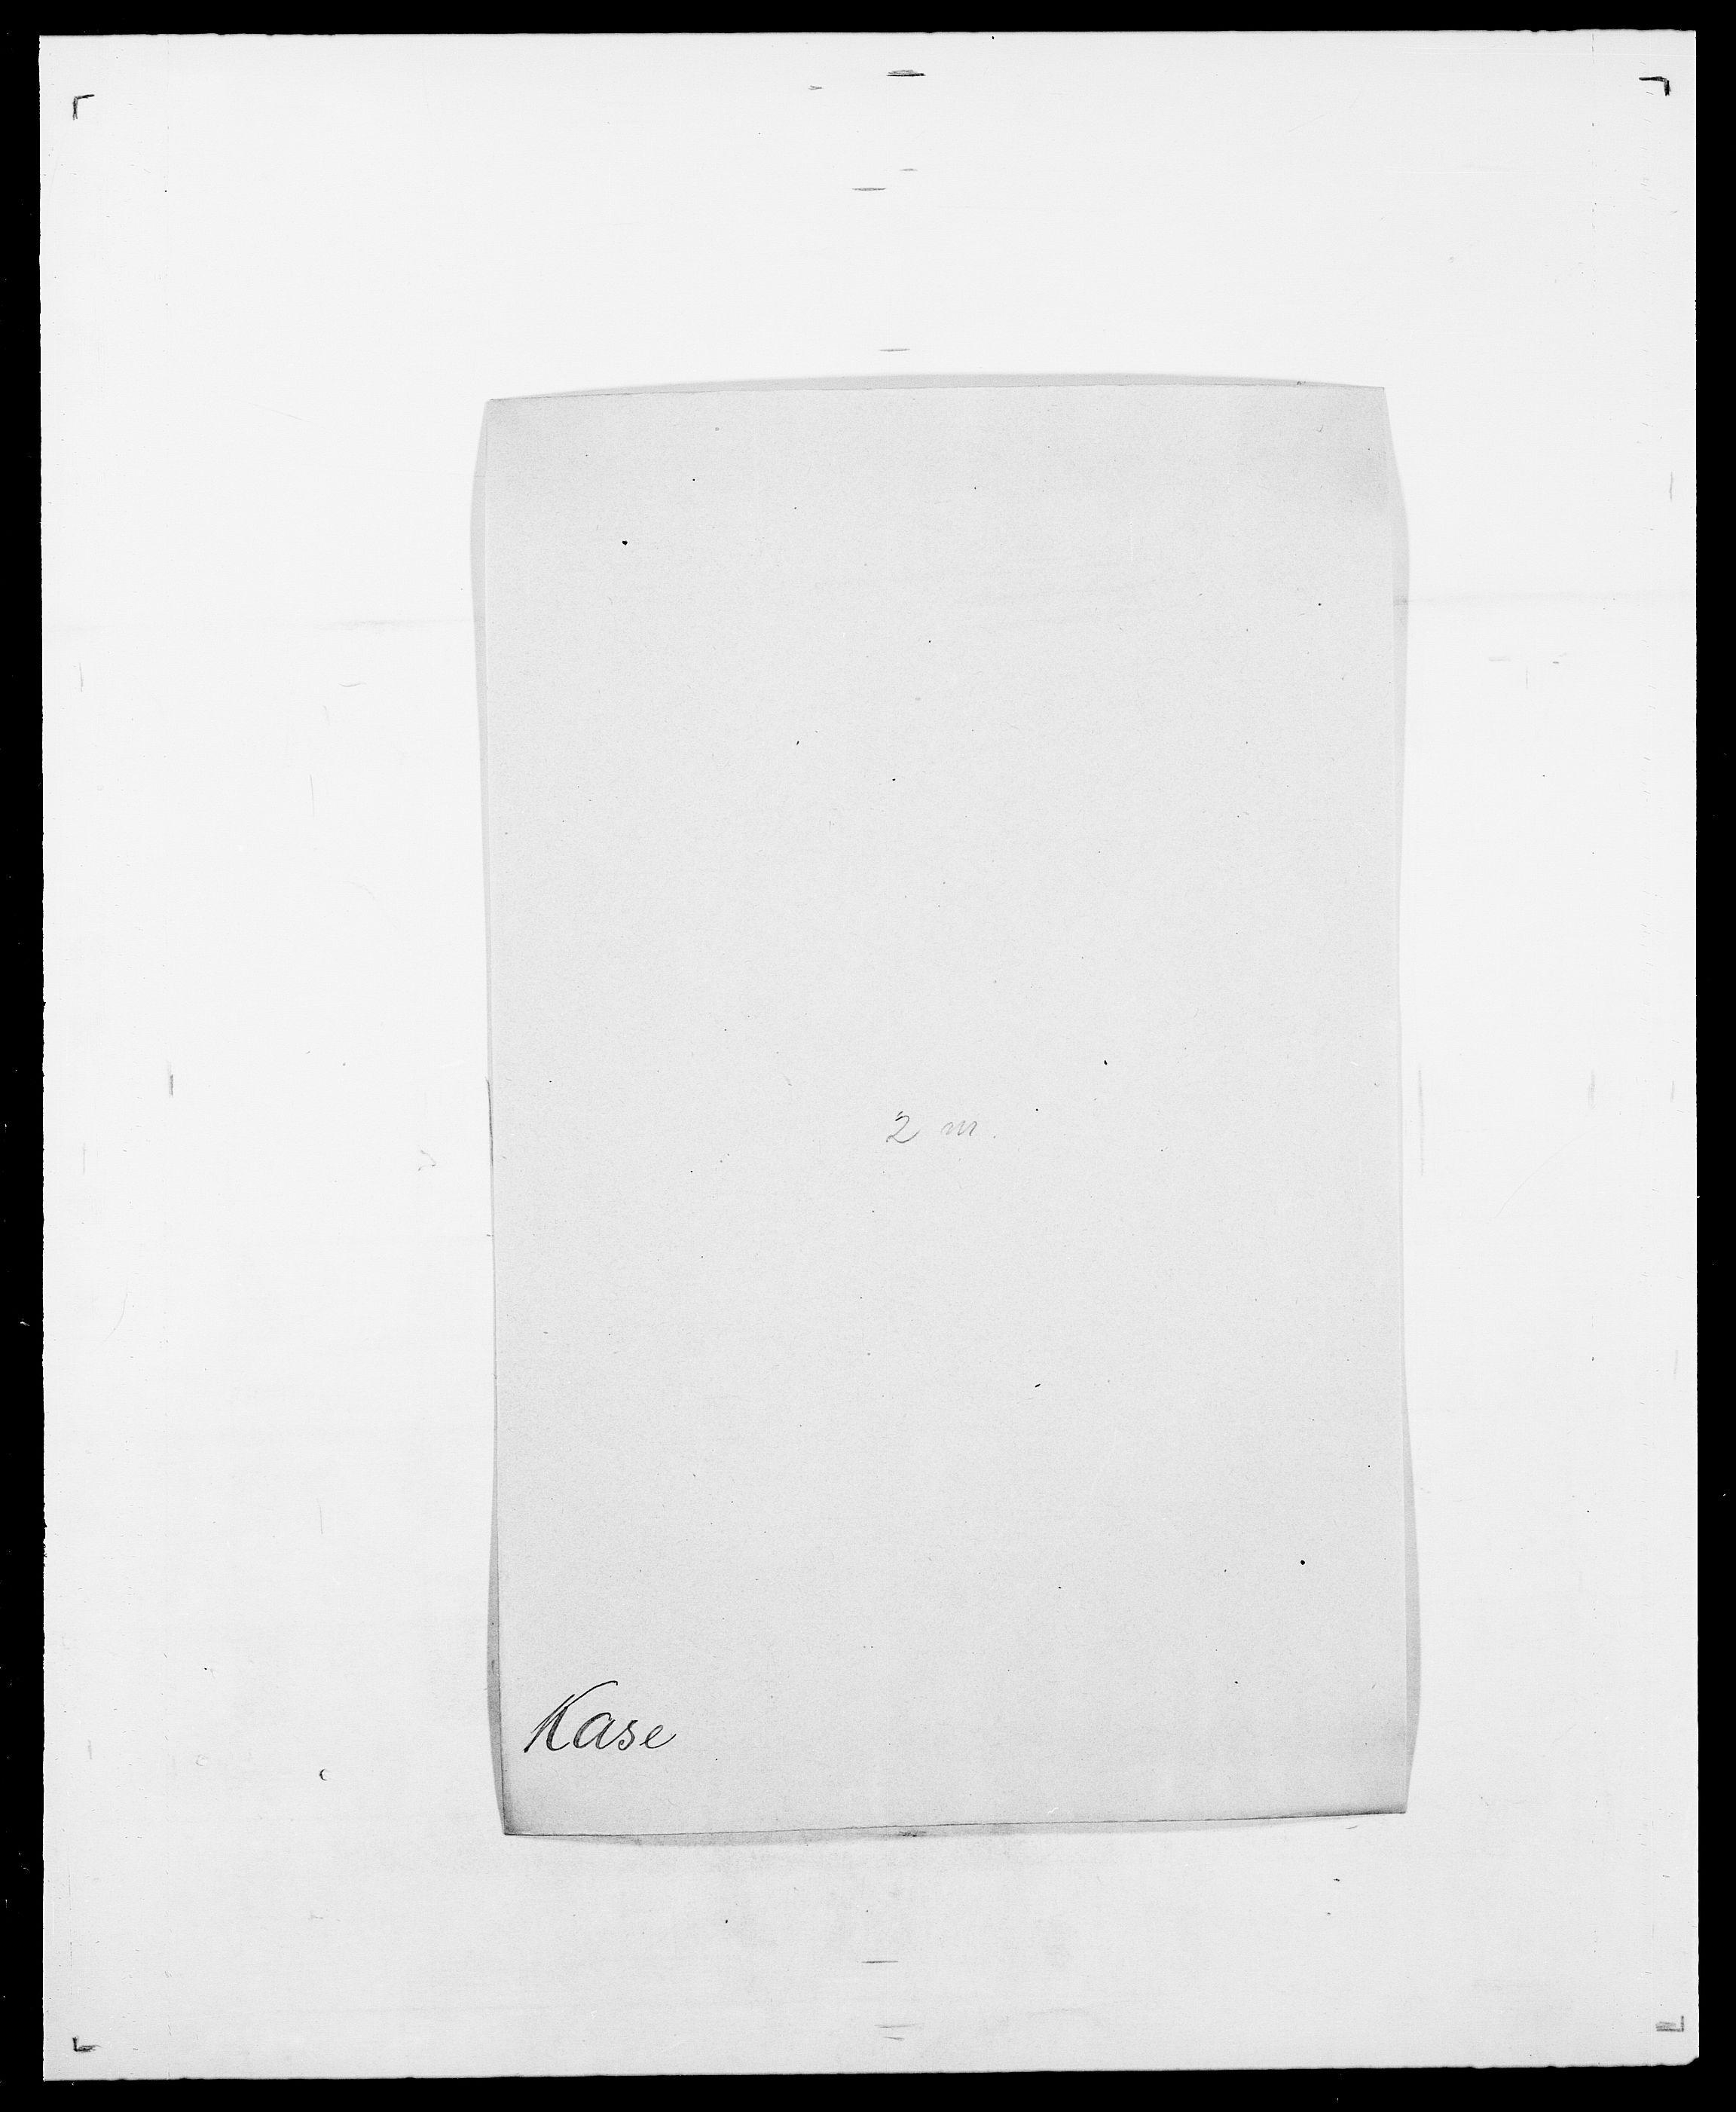 SAO, Delgobe, Charles Antoine - samling, D/Da/L0020: Irgens - Kjøsterud, s. 483